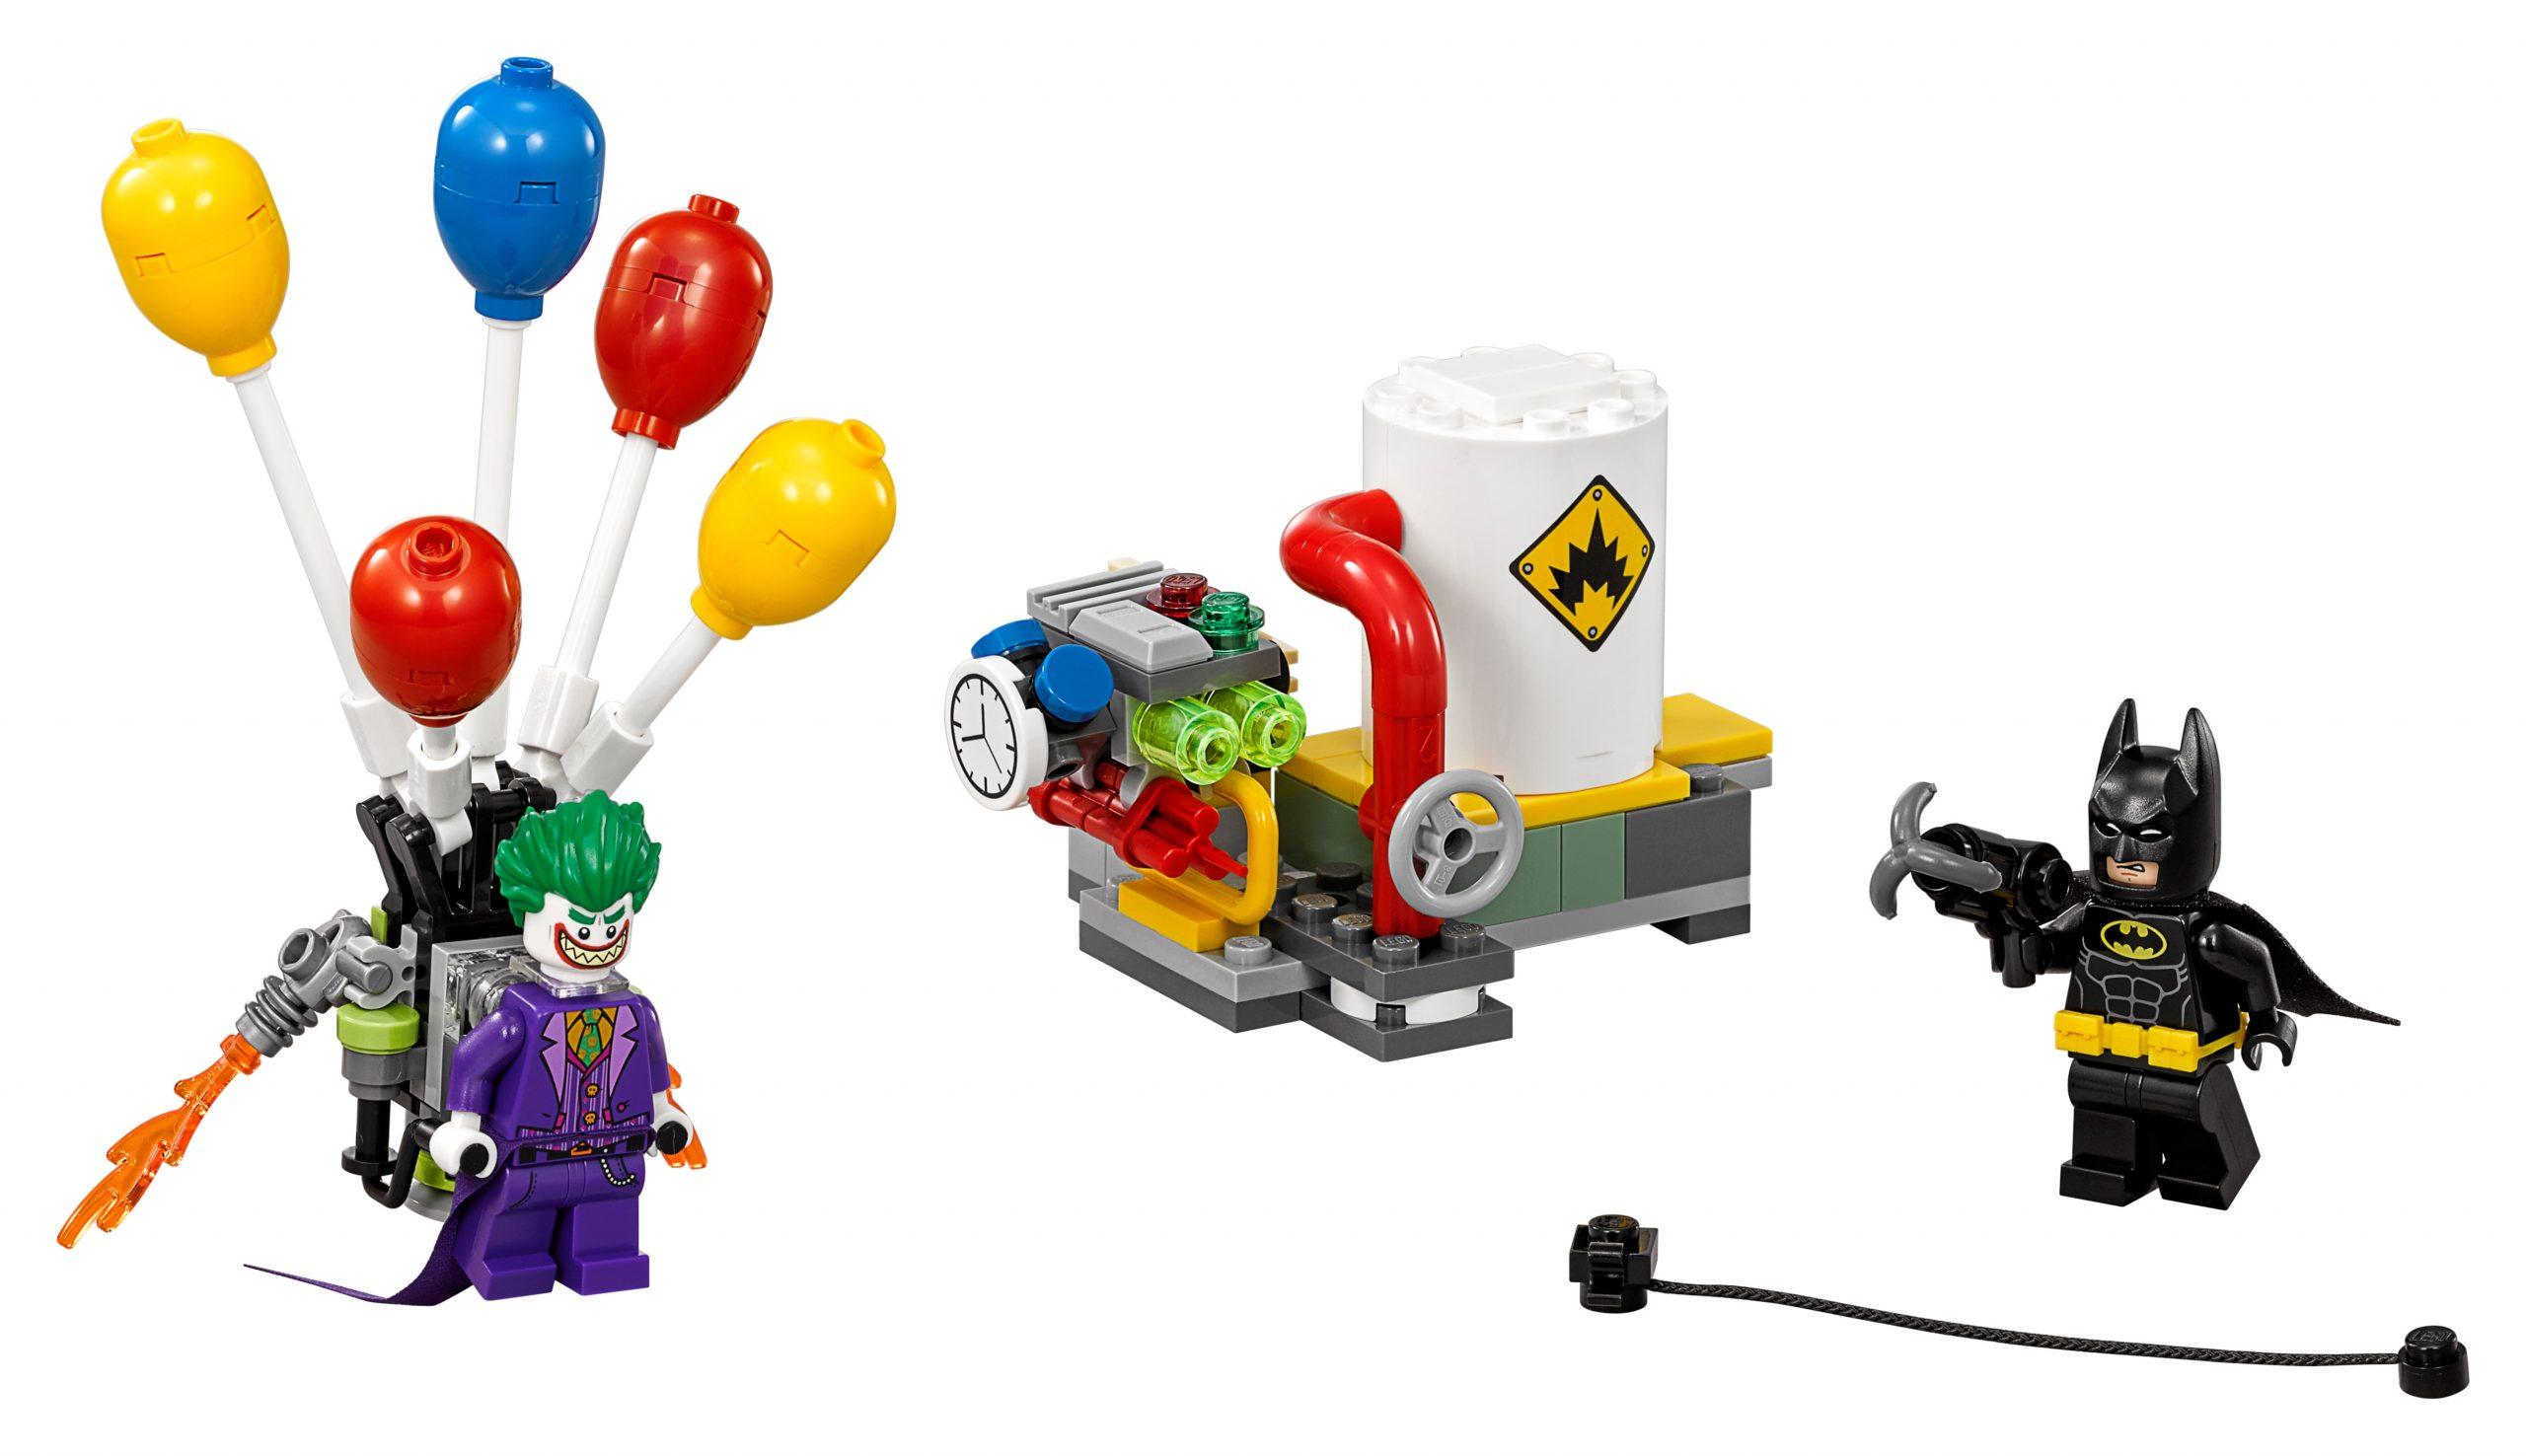 lego the joker ballonvlucht 70900 scaled